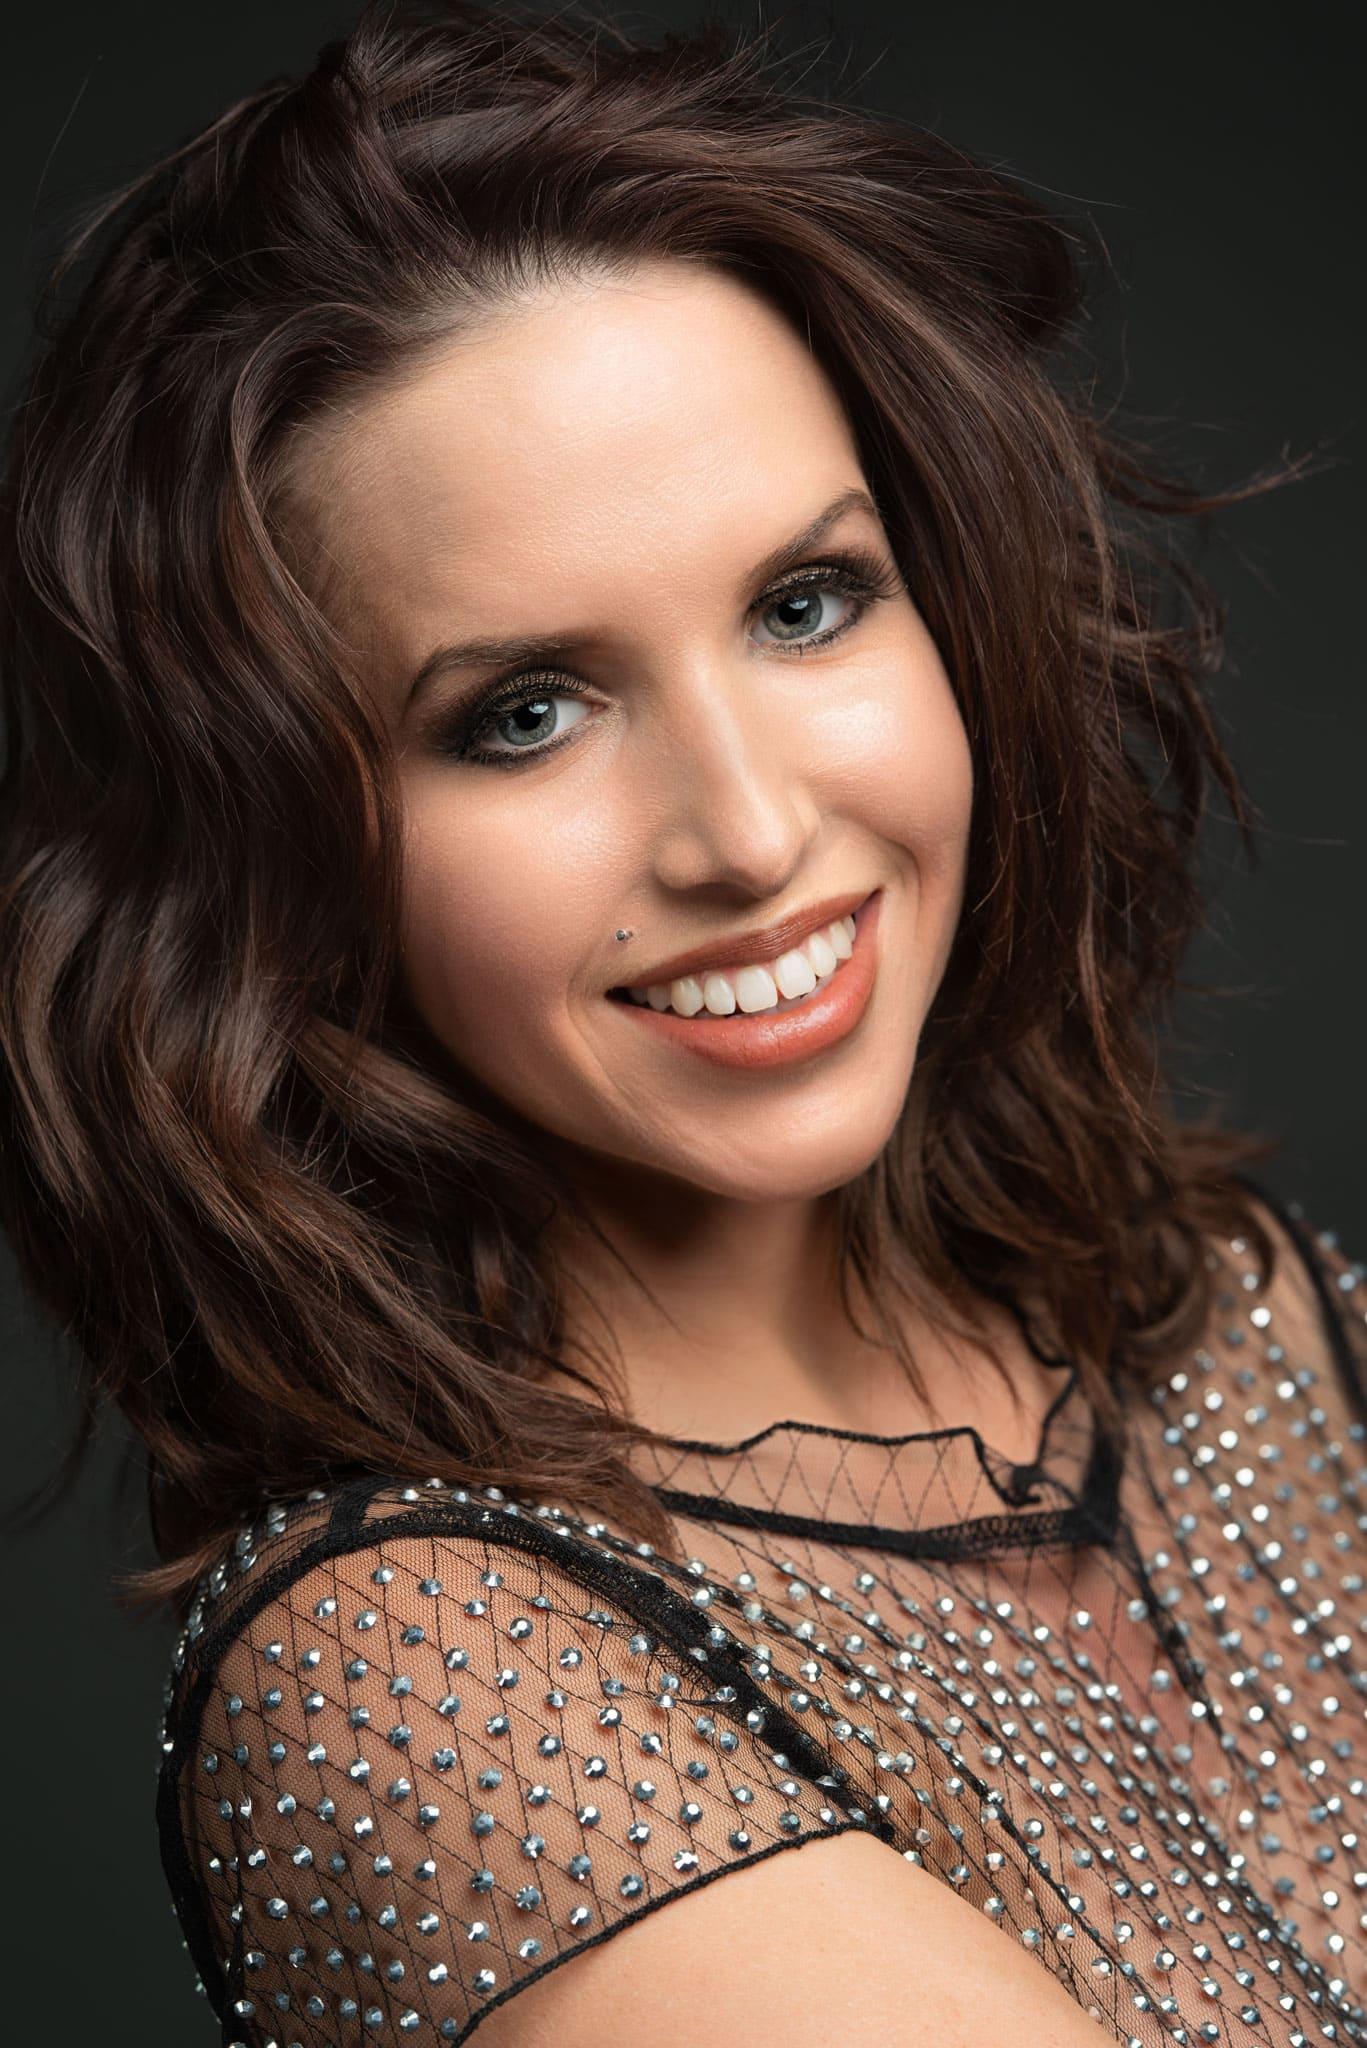 Las-Vegas-Headshot-Photographer-Actress-Model.jpg